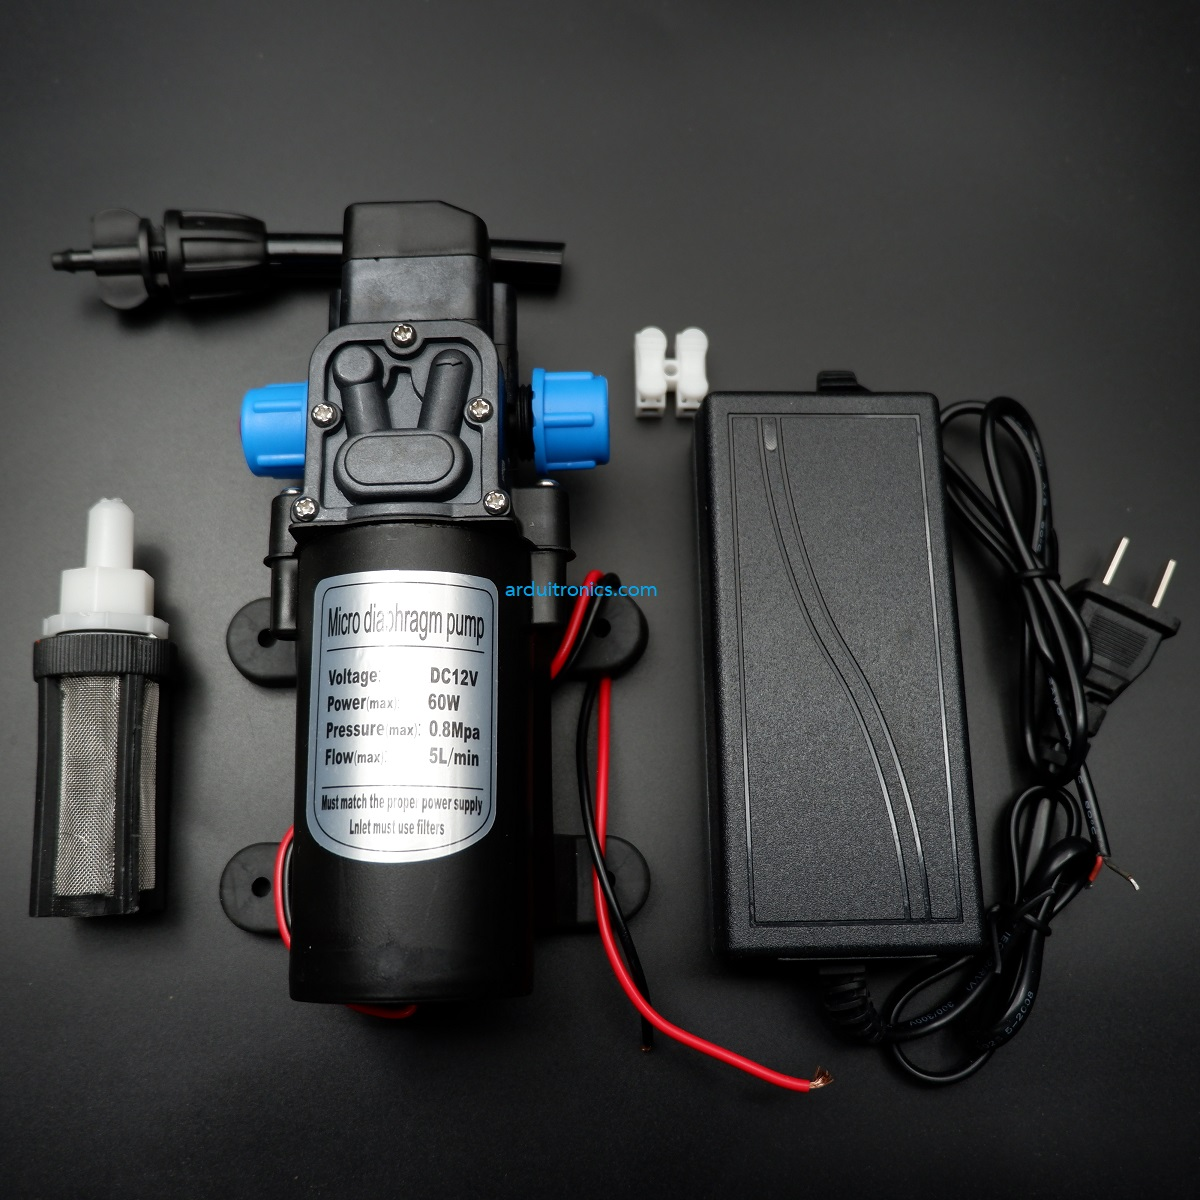 Diaphragm Pump 60Watt 12VDC (5L/min) with Filter and Power Adapter - ไดอะแฟรมปั๊มน้ำมาพร้อมฟิลเตอร์และอะแดปเตอร์แปลงไฟ